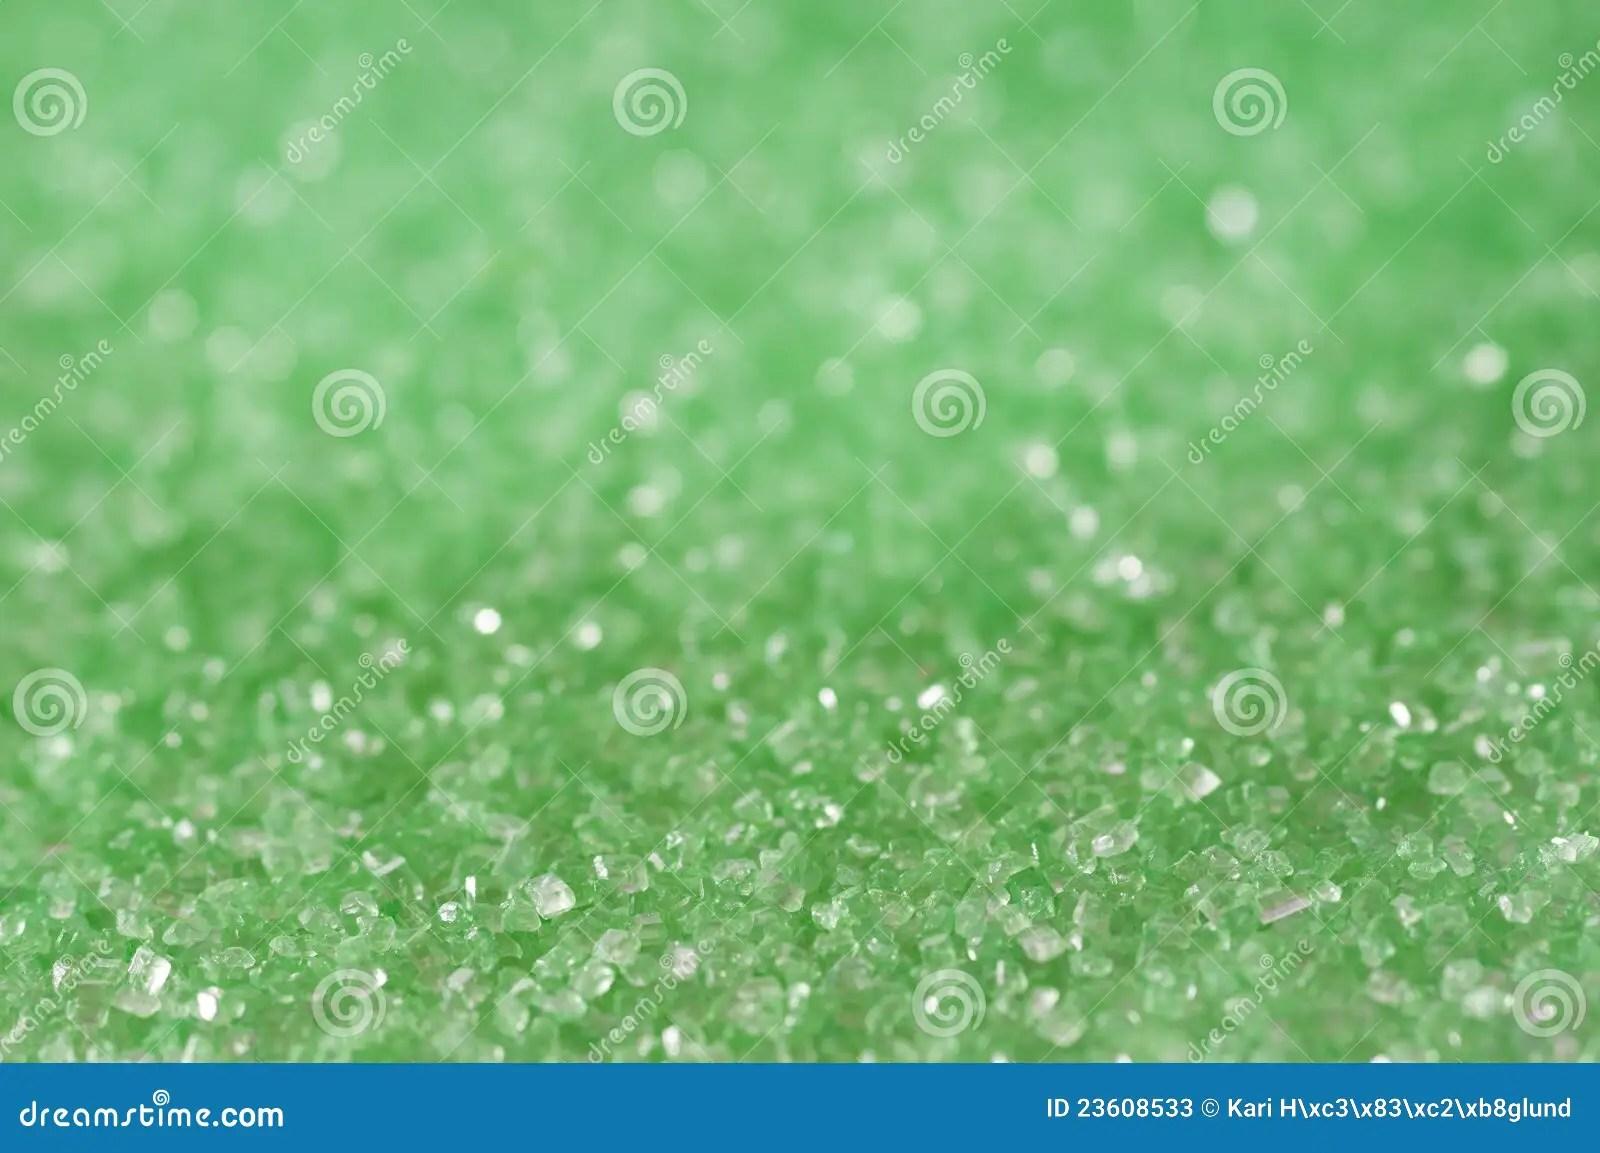 Green Sugar Sparkle Background Stock Photos Image 23608533